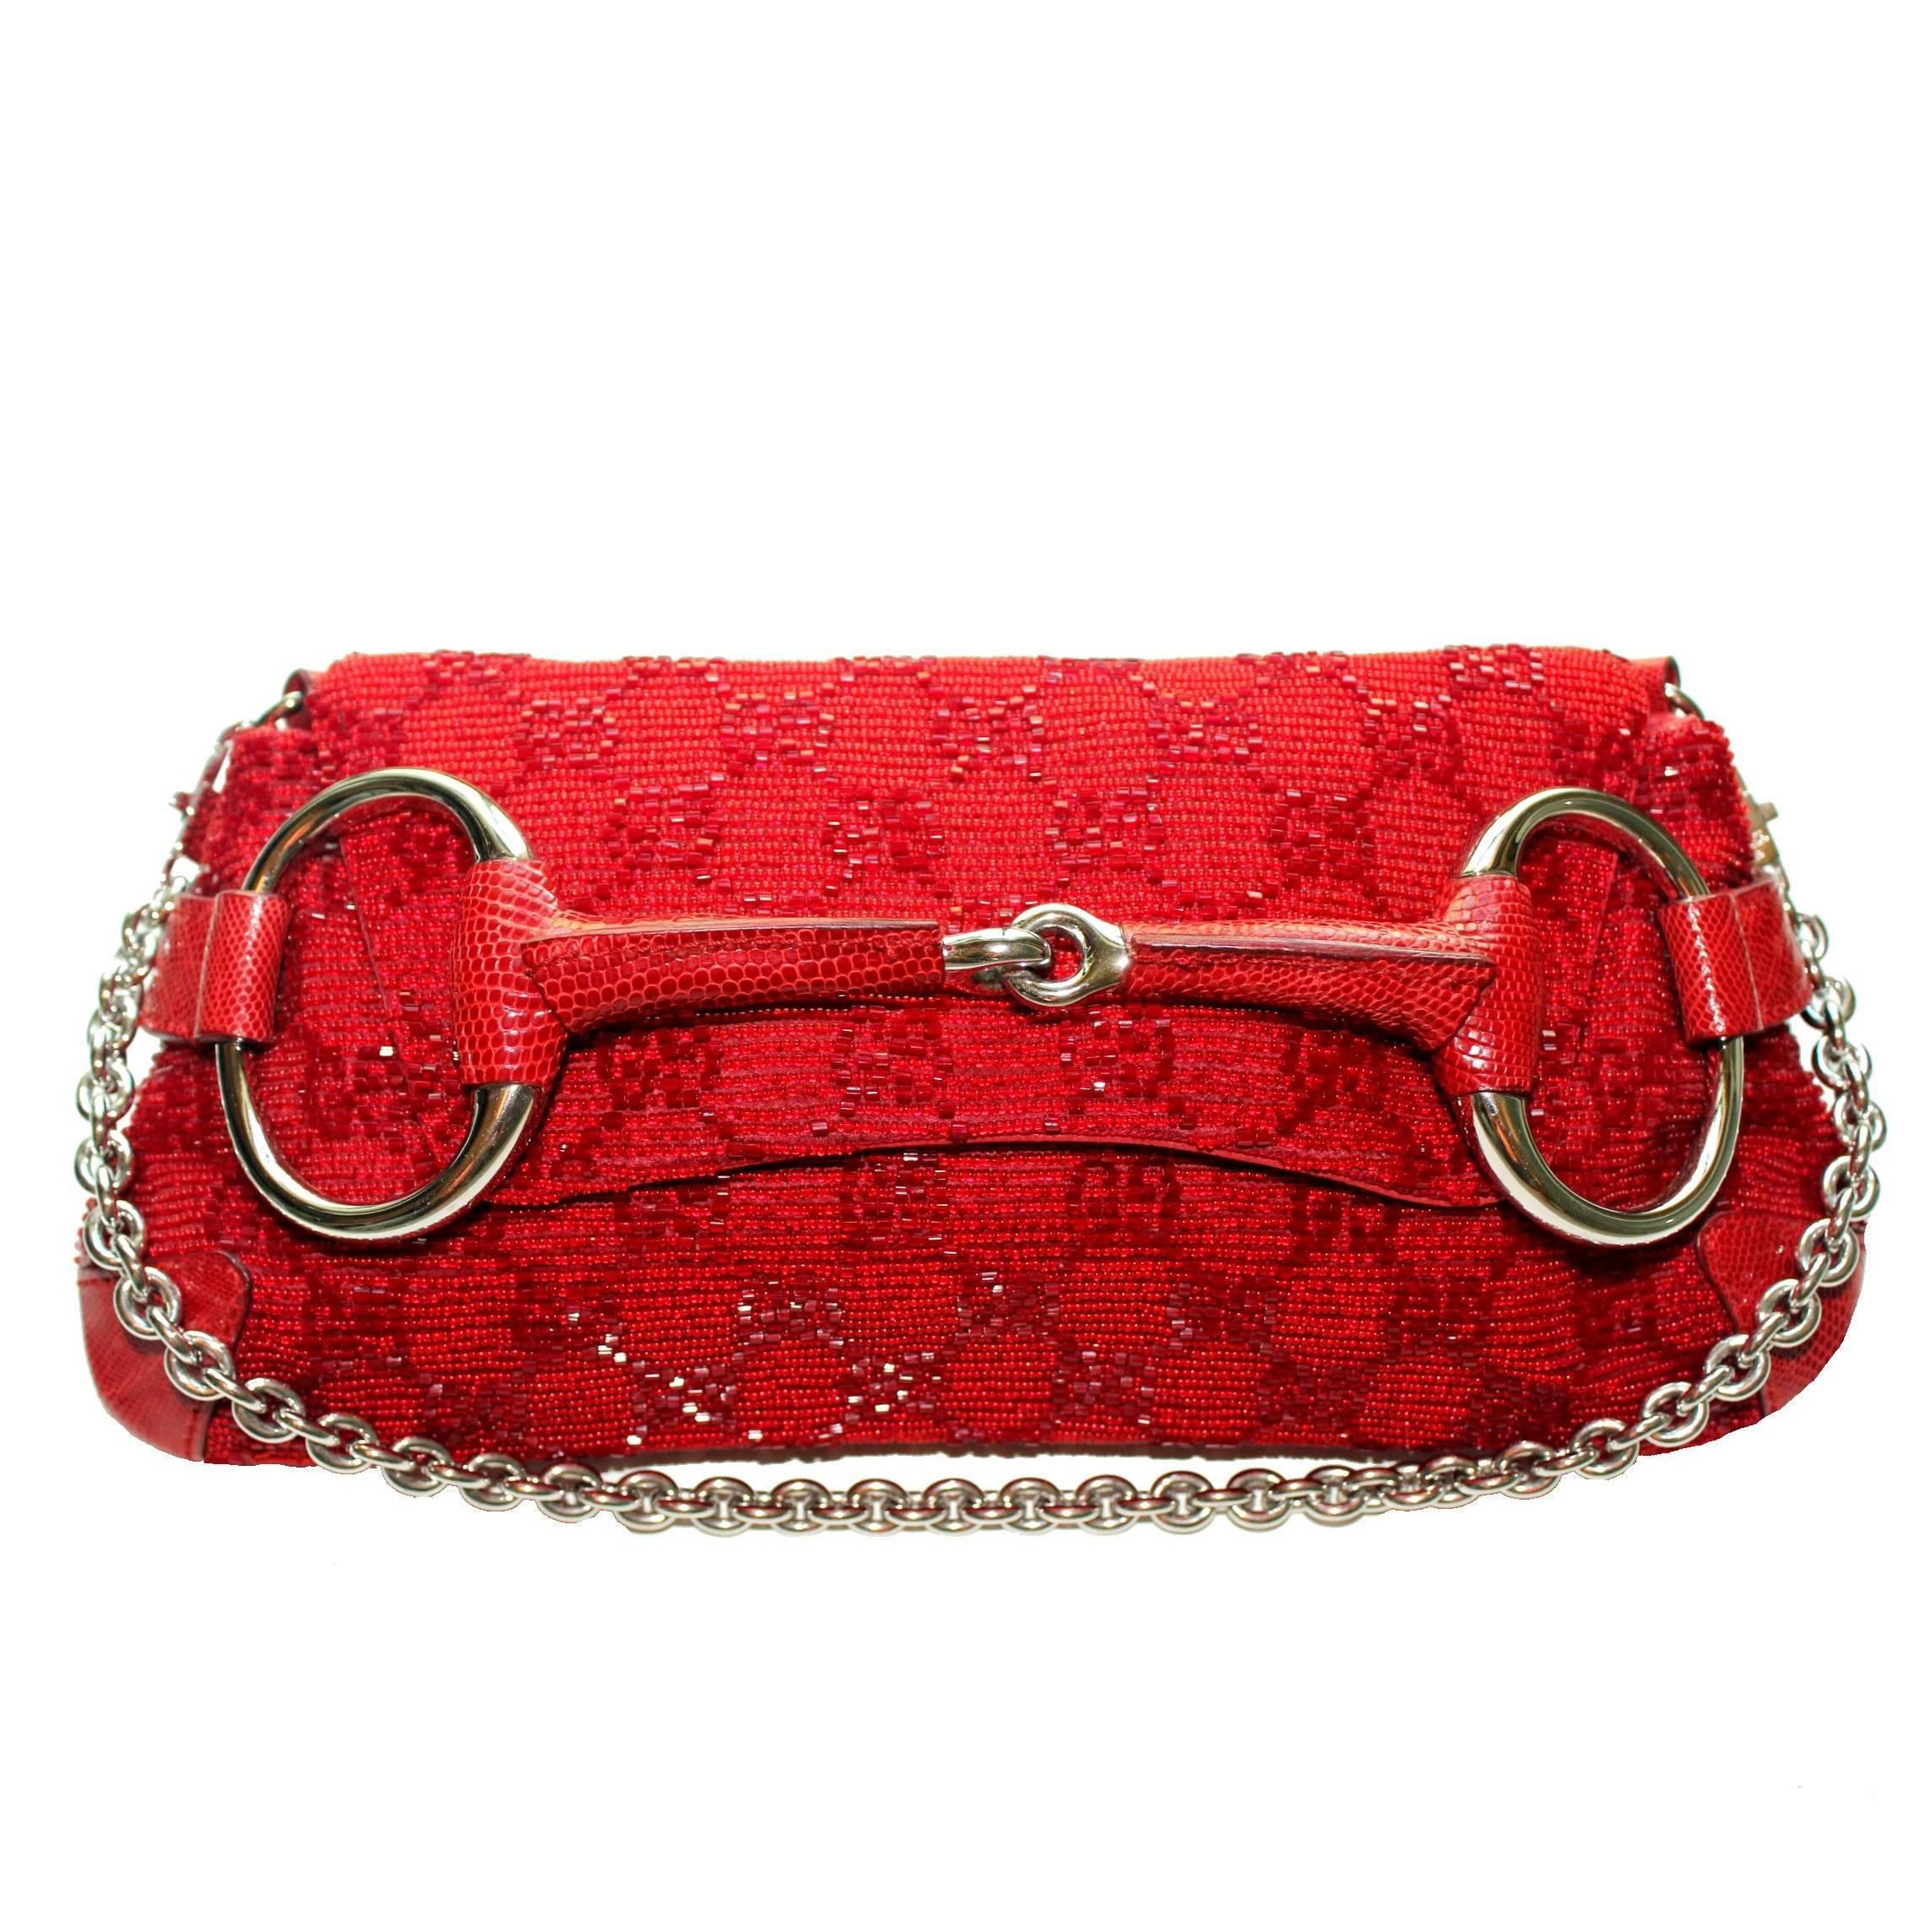 Gucci Gg Monogram Beaded Crystal And Lizard Skin Horsebit Bag Clutch YtOL5fJMP